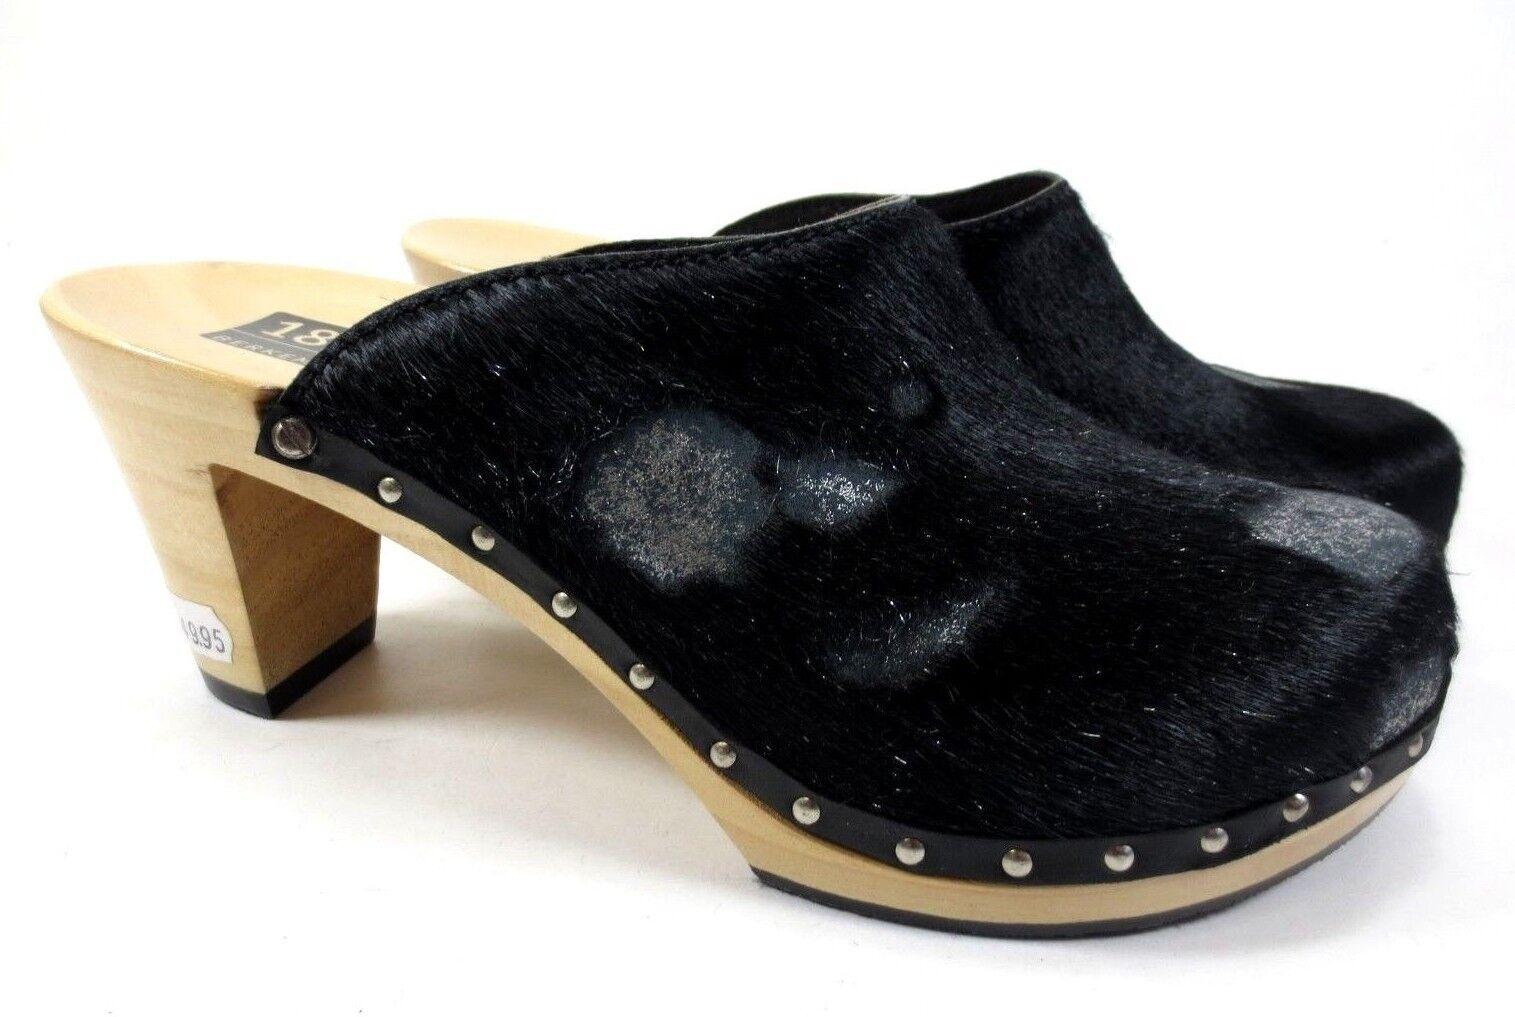 BERKEMANN Miley CLOGS Leder Holz Pantoletten black Kuhfell Fell NEU 149,95